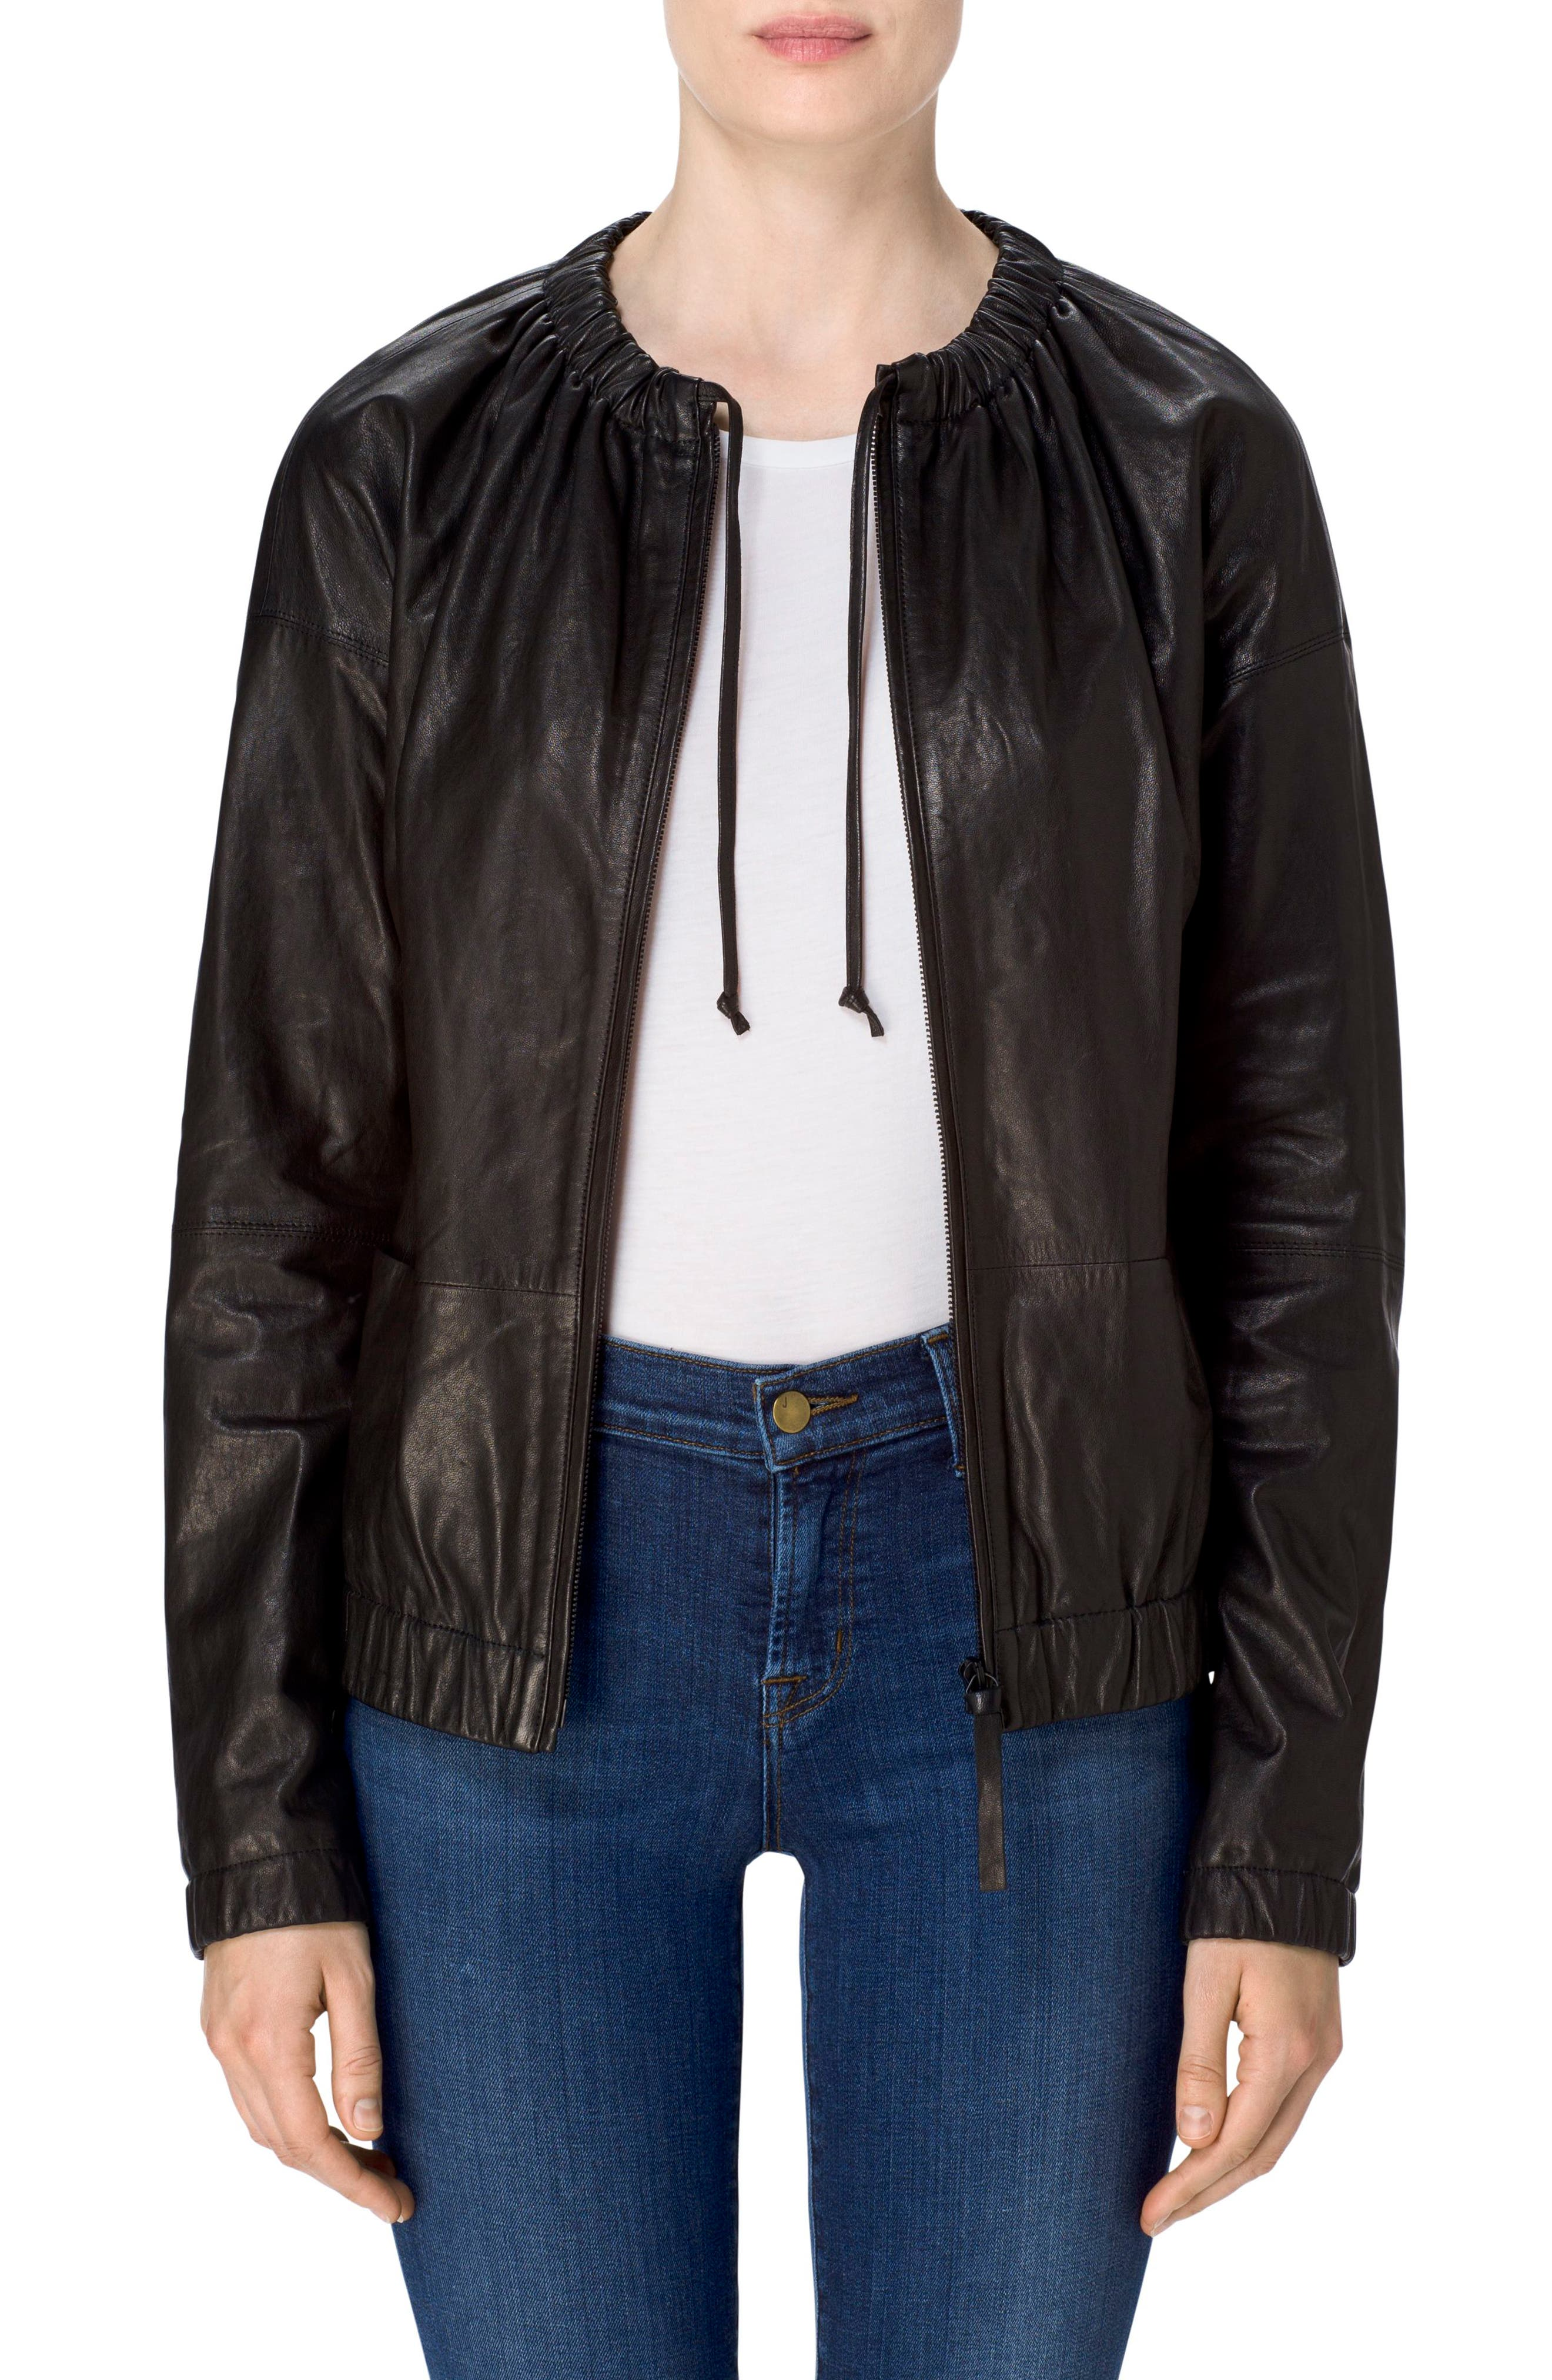 J Brand Baez Leather Bomber Jacket